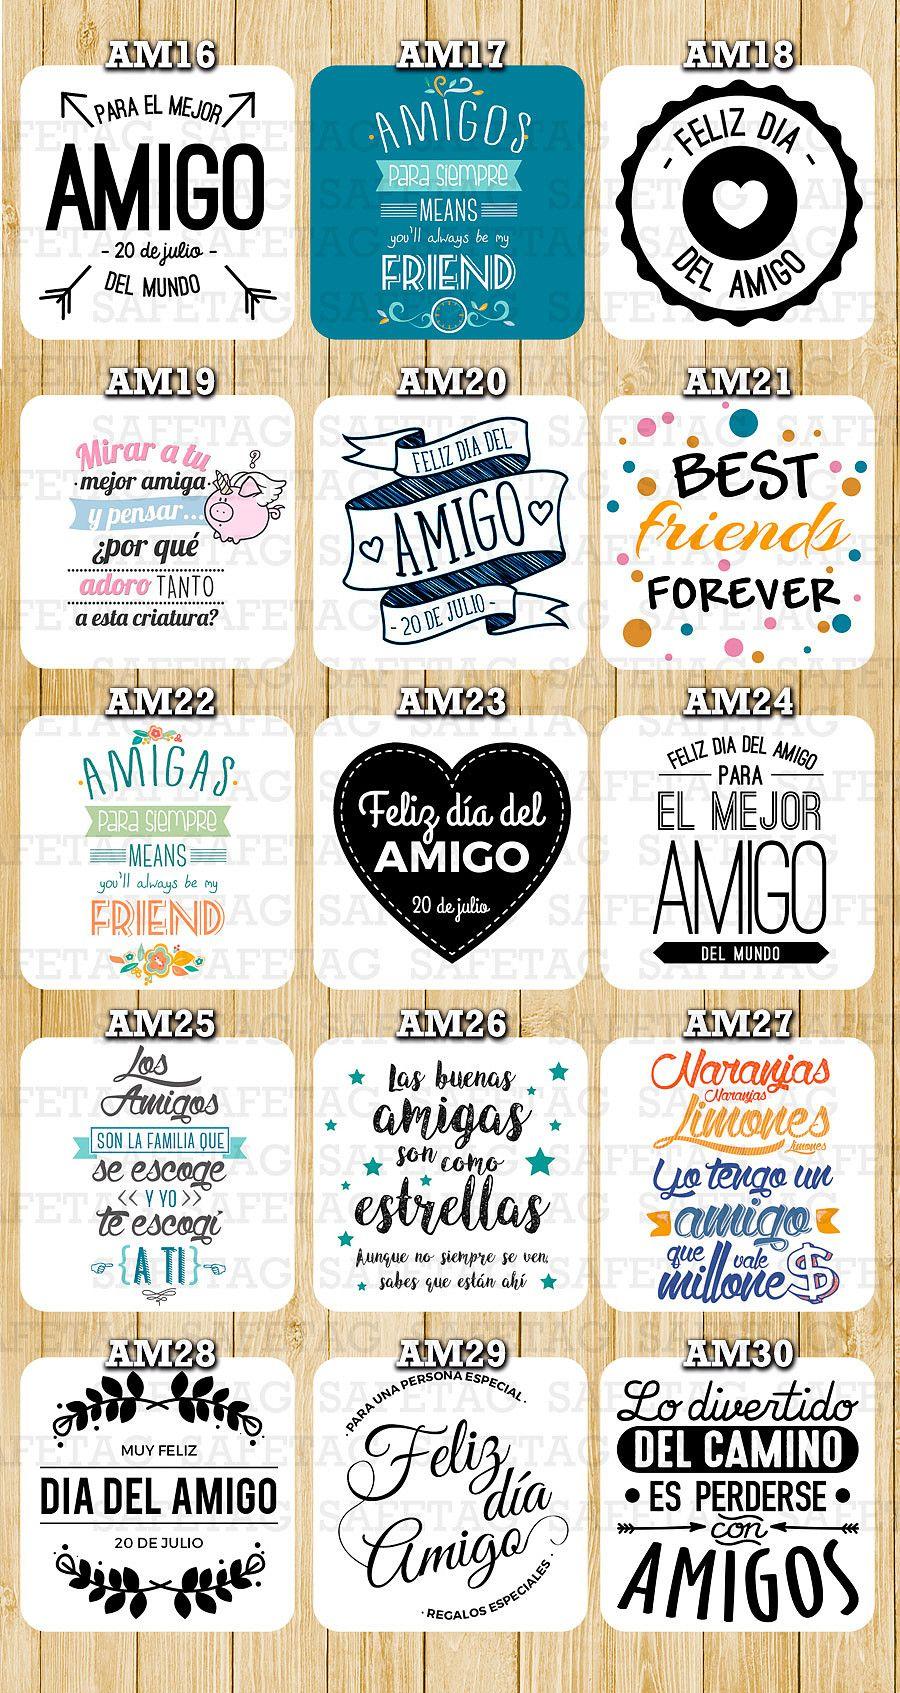 Etiquetas Autoadhesivas Frases Frascos Vasos Botellas X 55 - $ 79,90 ...